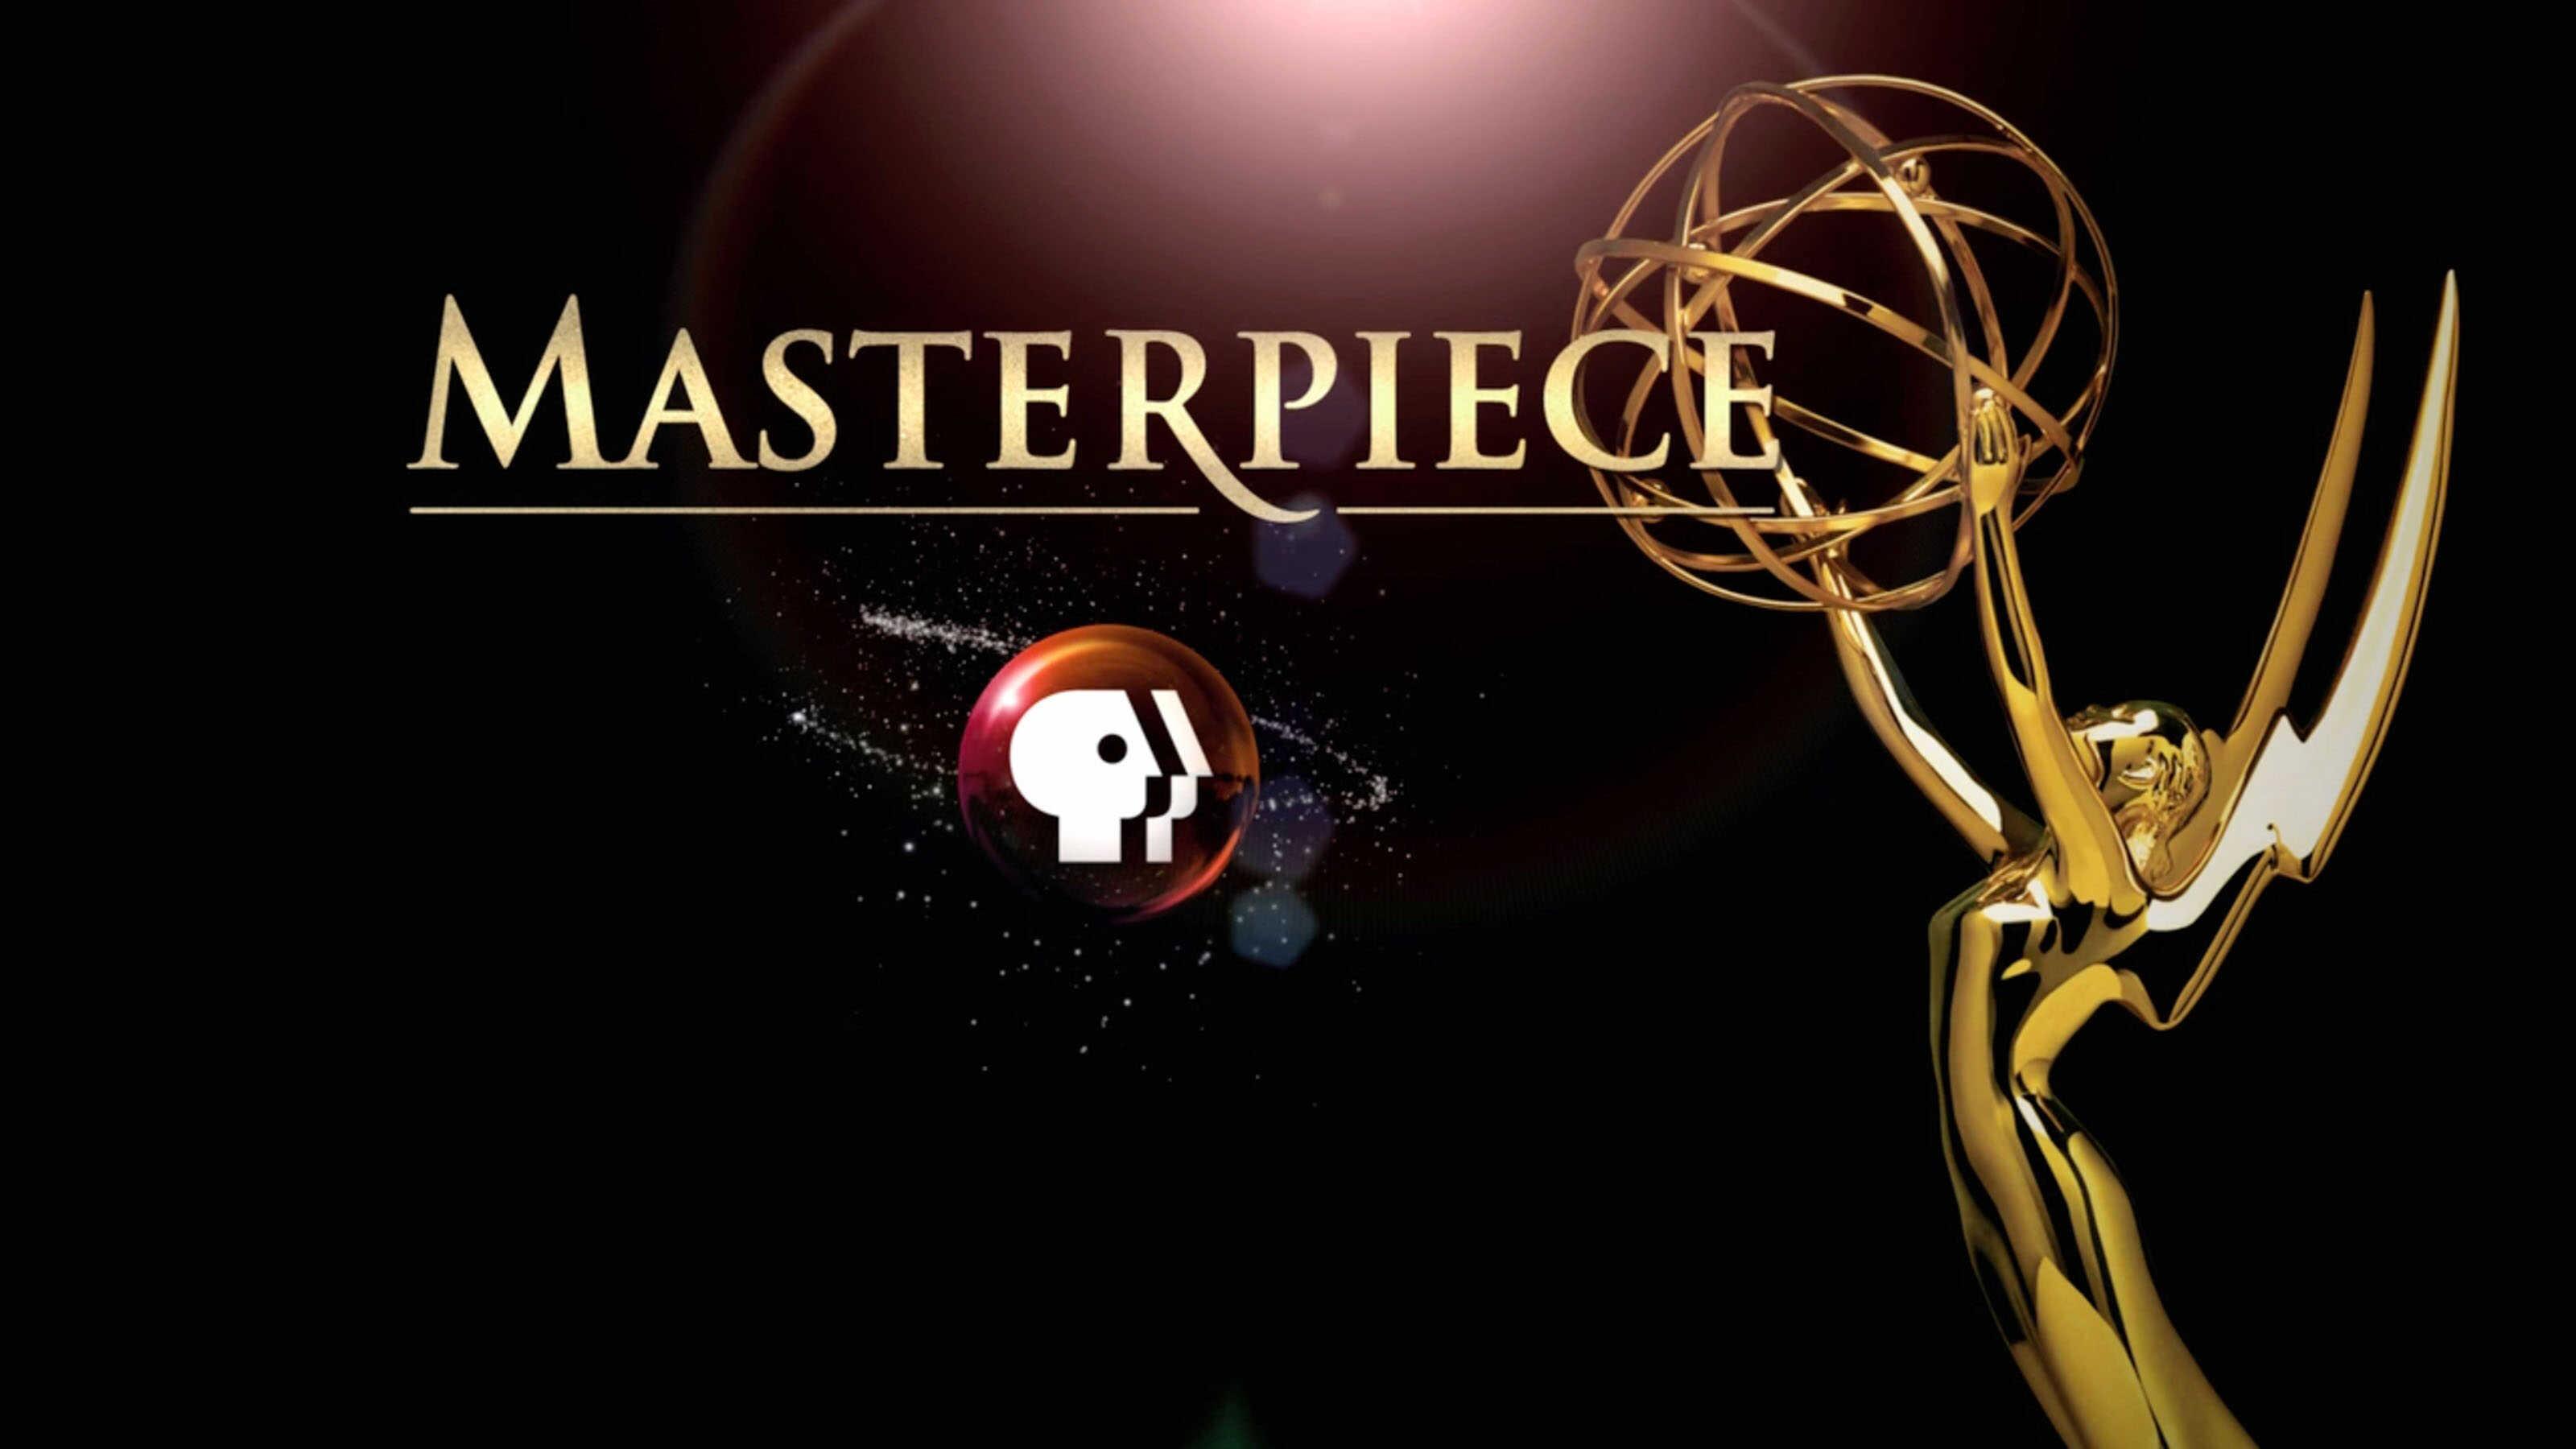 masterpiece_2014_emmy_nominations_promo